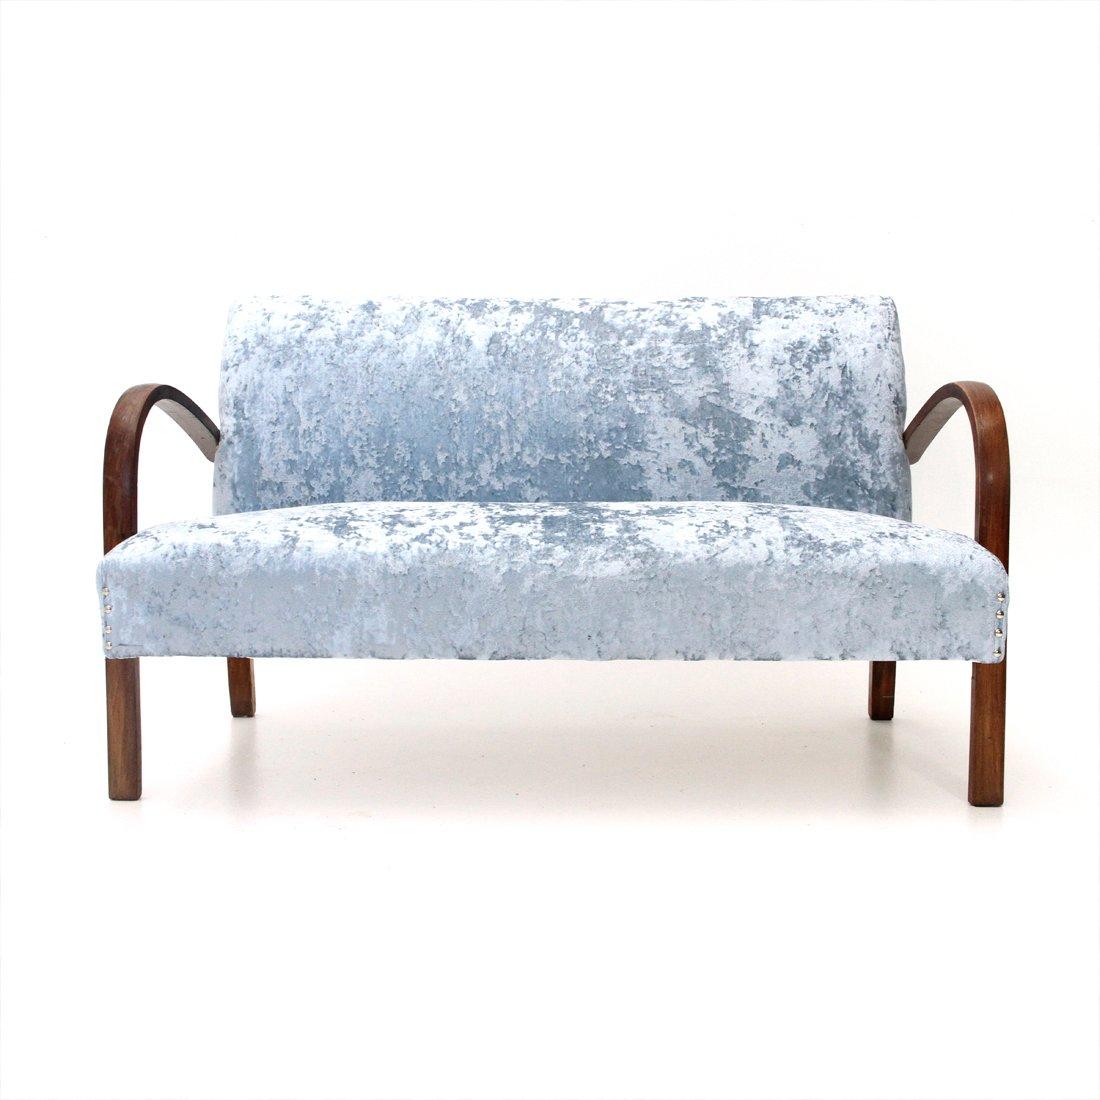 Malerisch Hellblaues Sofa Beste Wahl Blaues Vintage Samt Sofa, 1940er